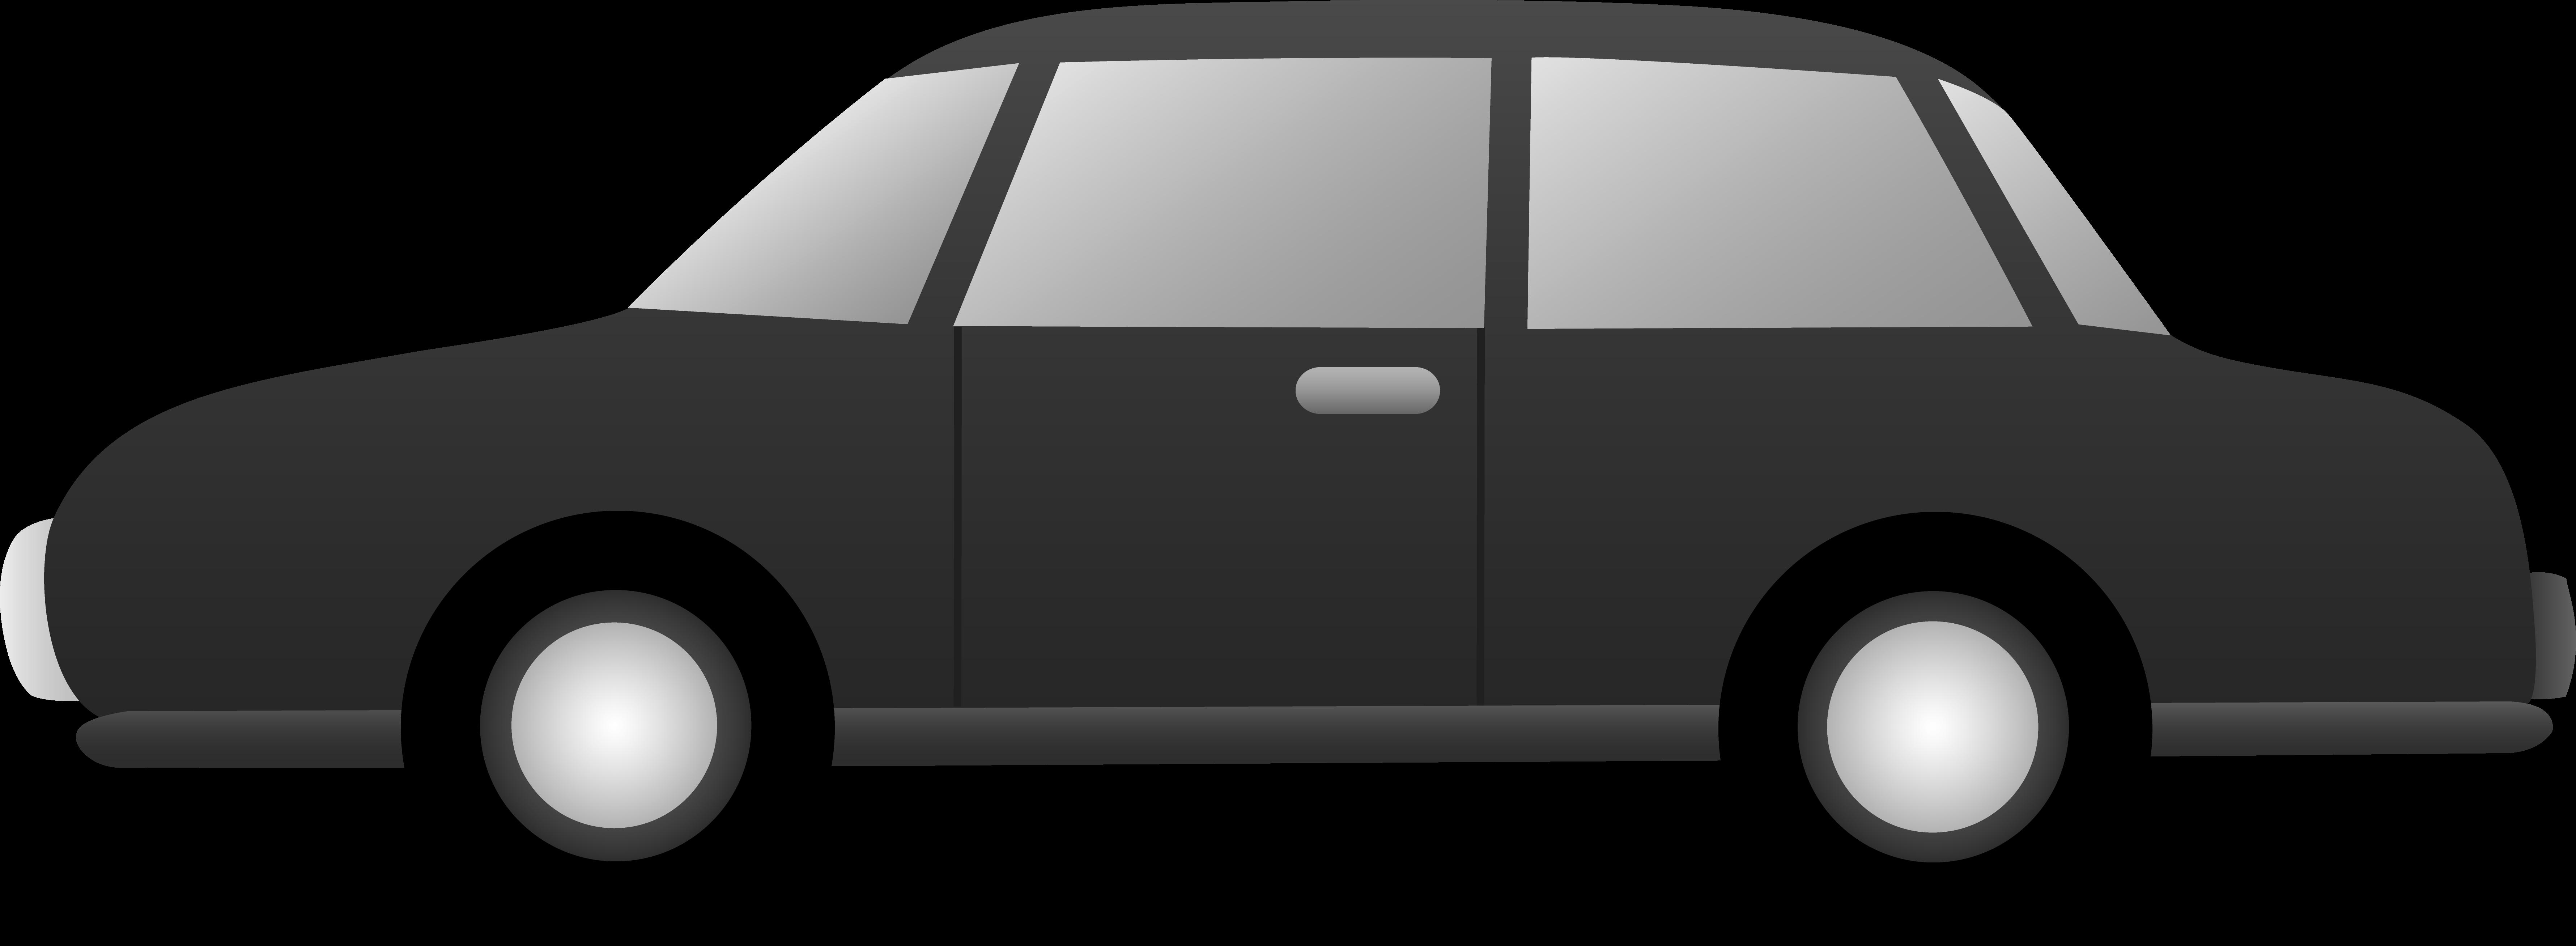 Toy Car Clipart - ClipartBlack.com graphic transparent